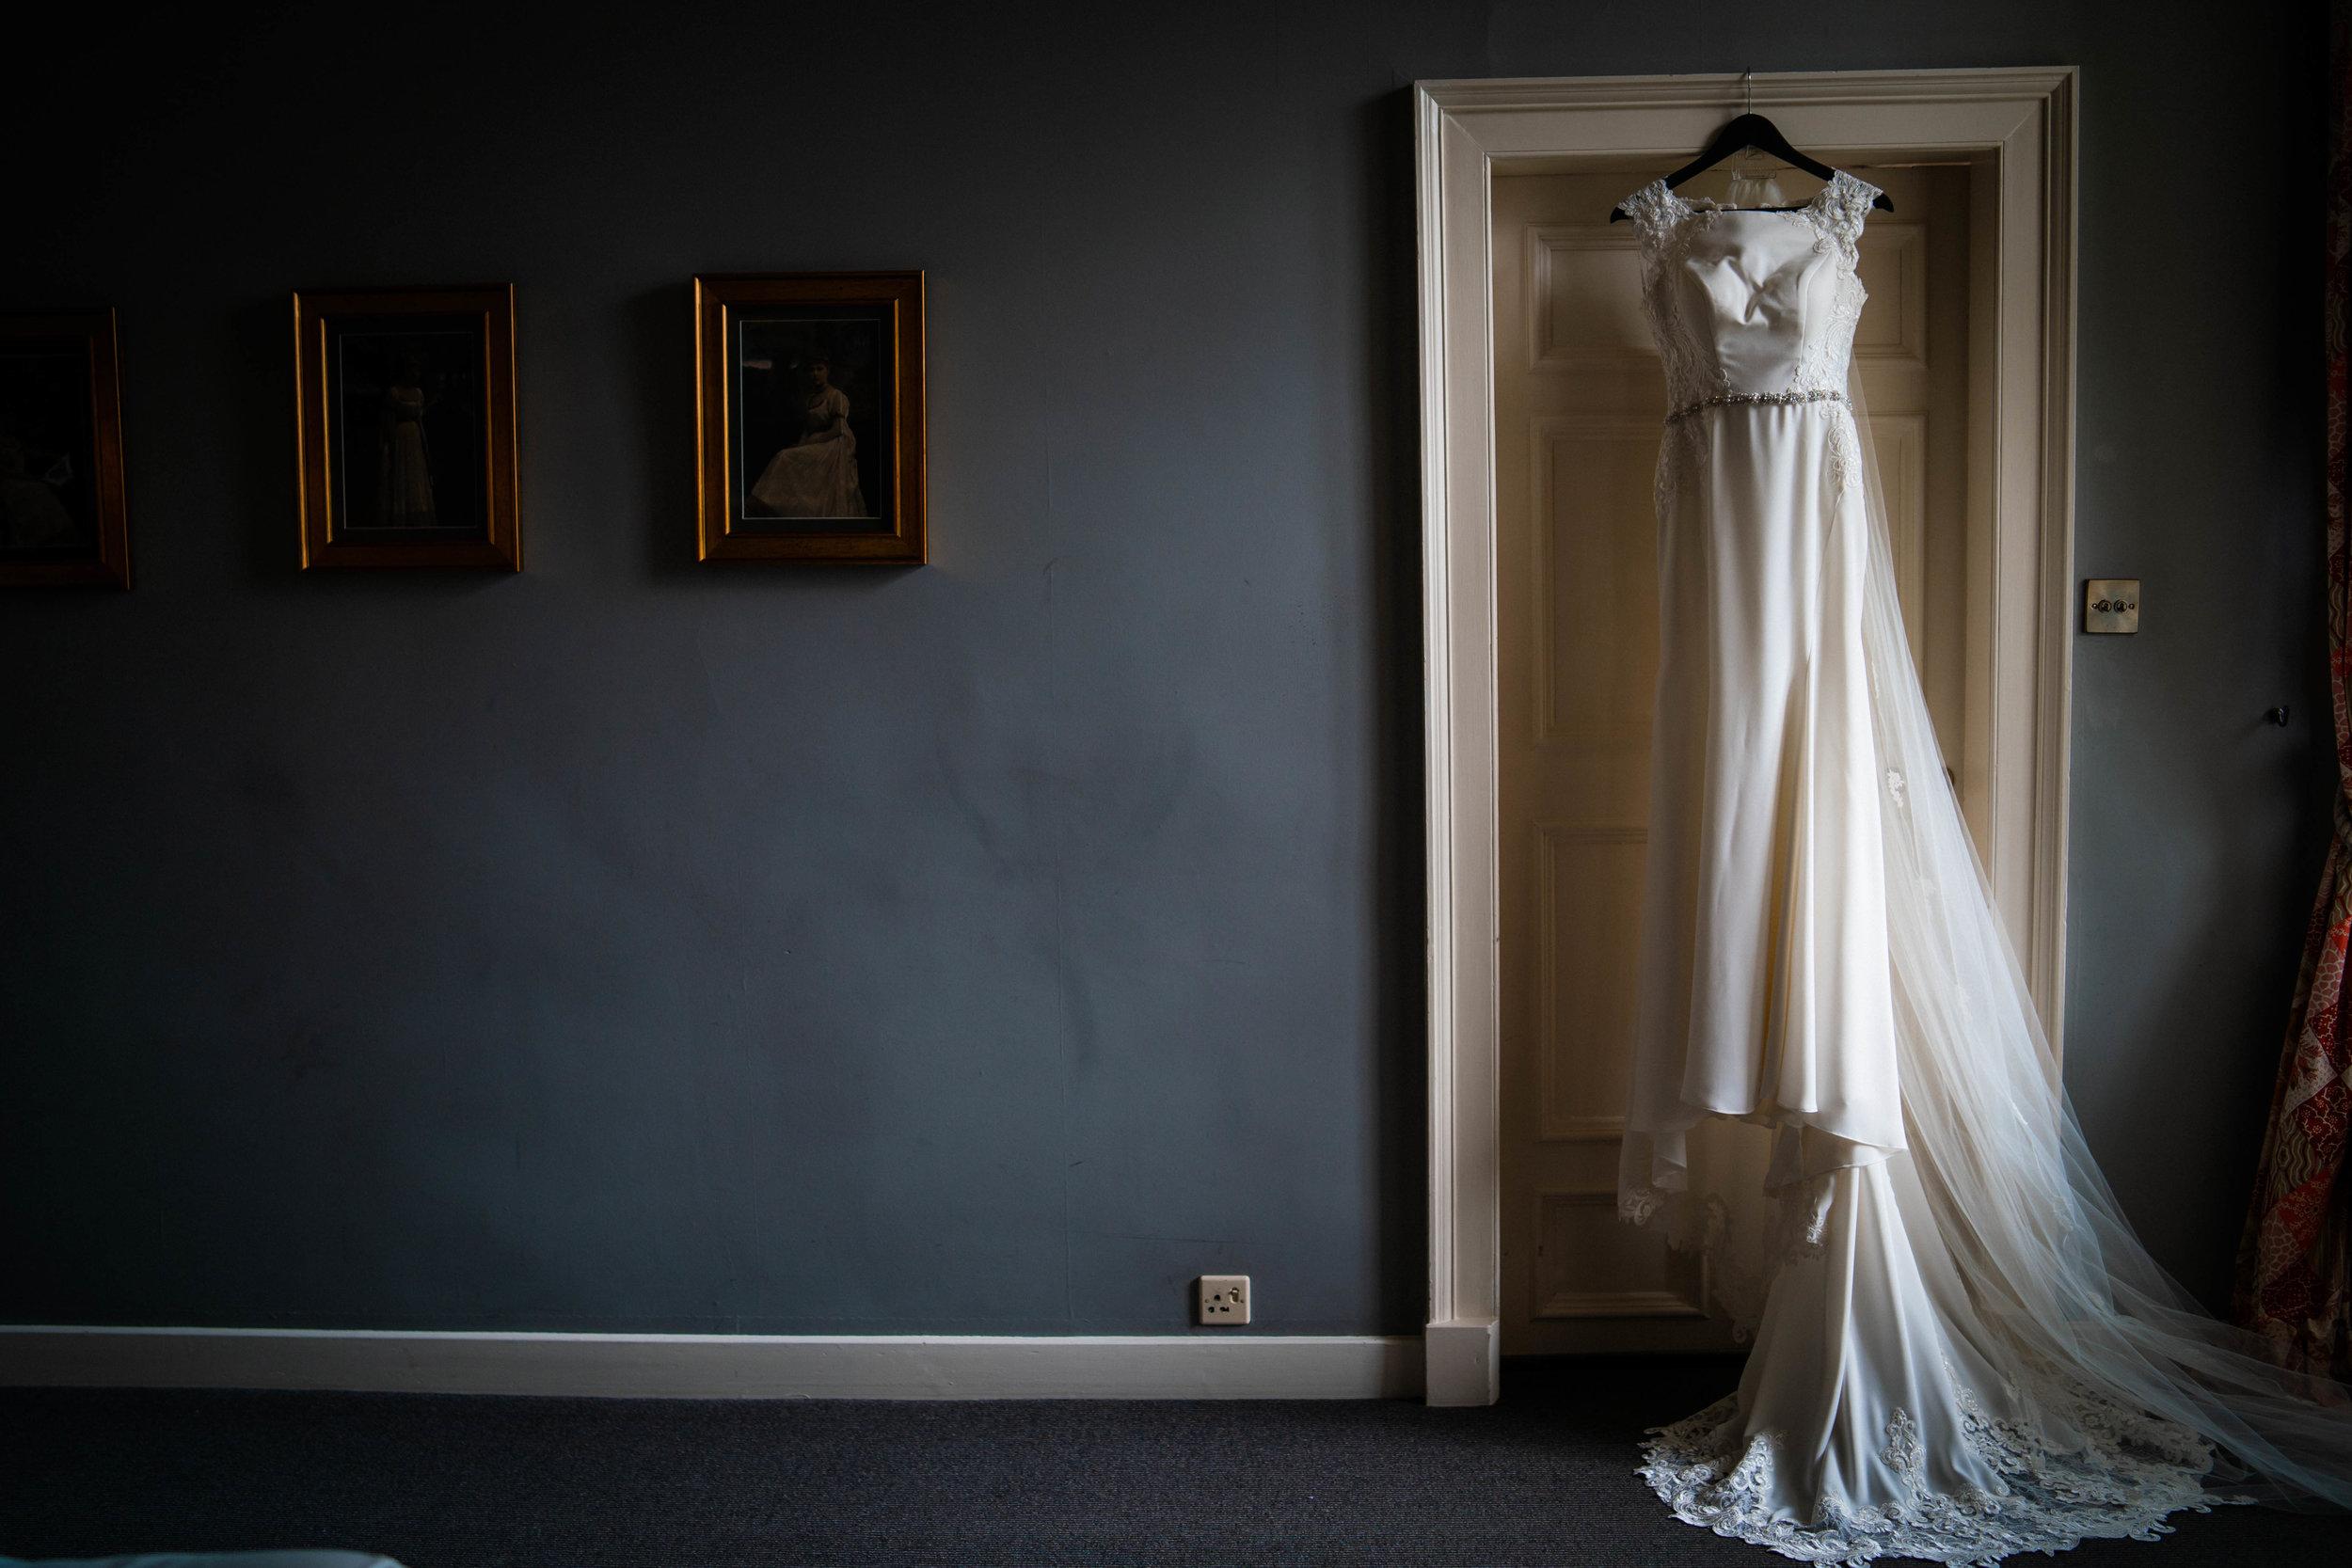 Askham Hall Antoni Wigley Photography 4.jpg